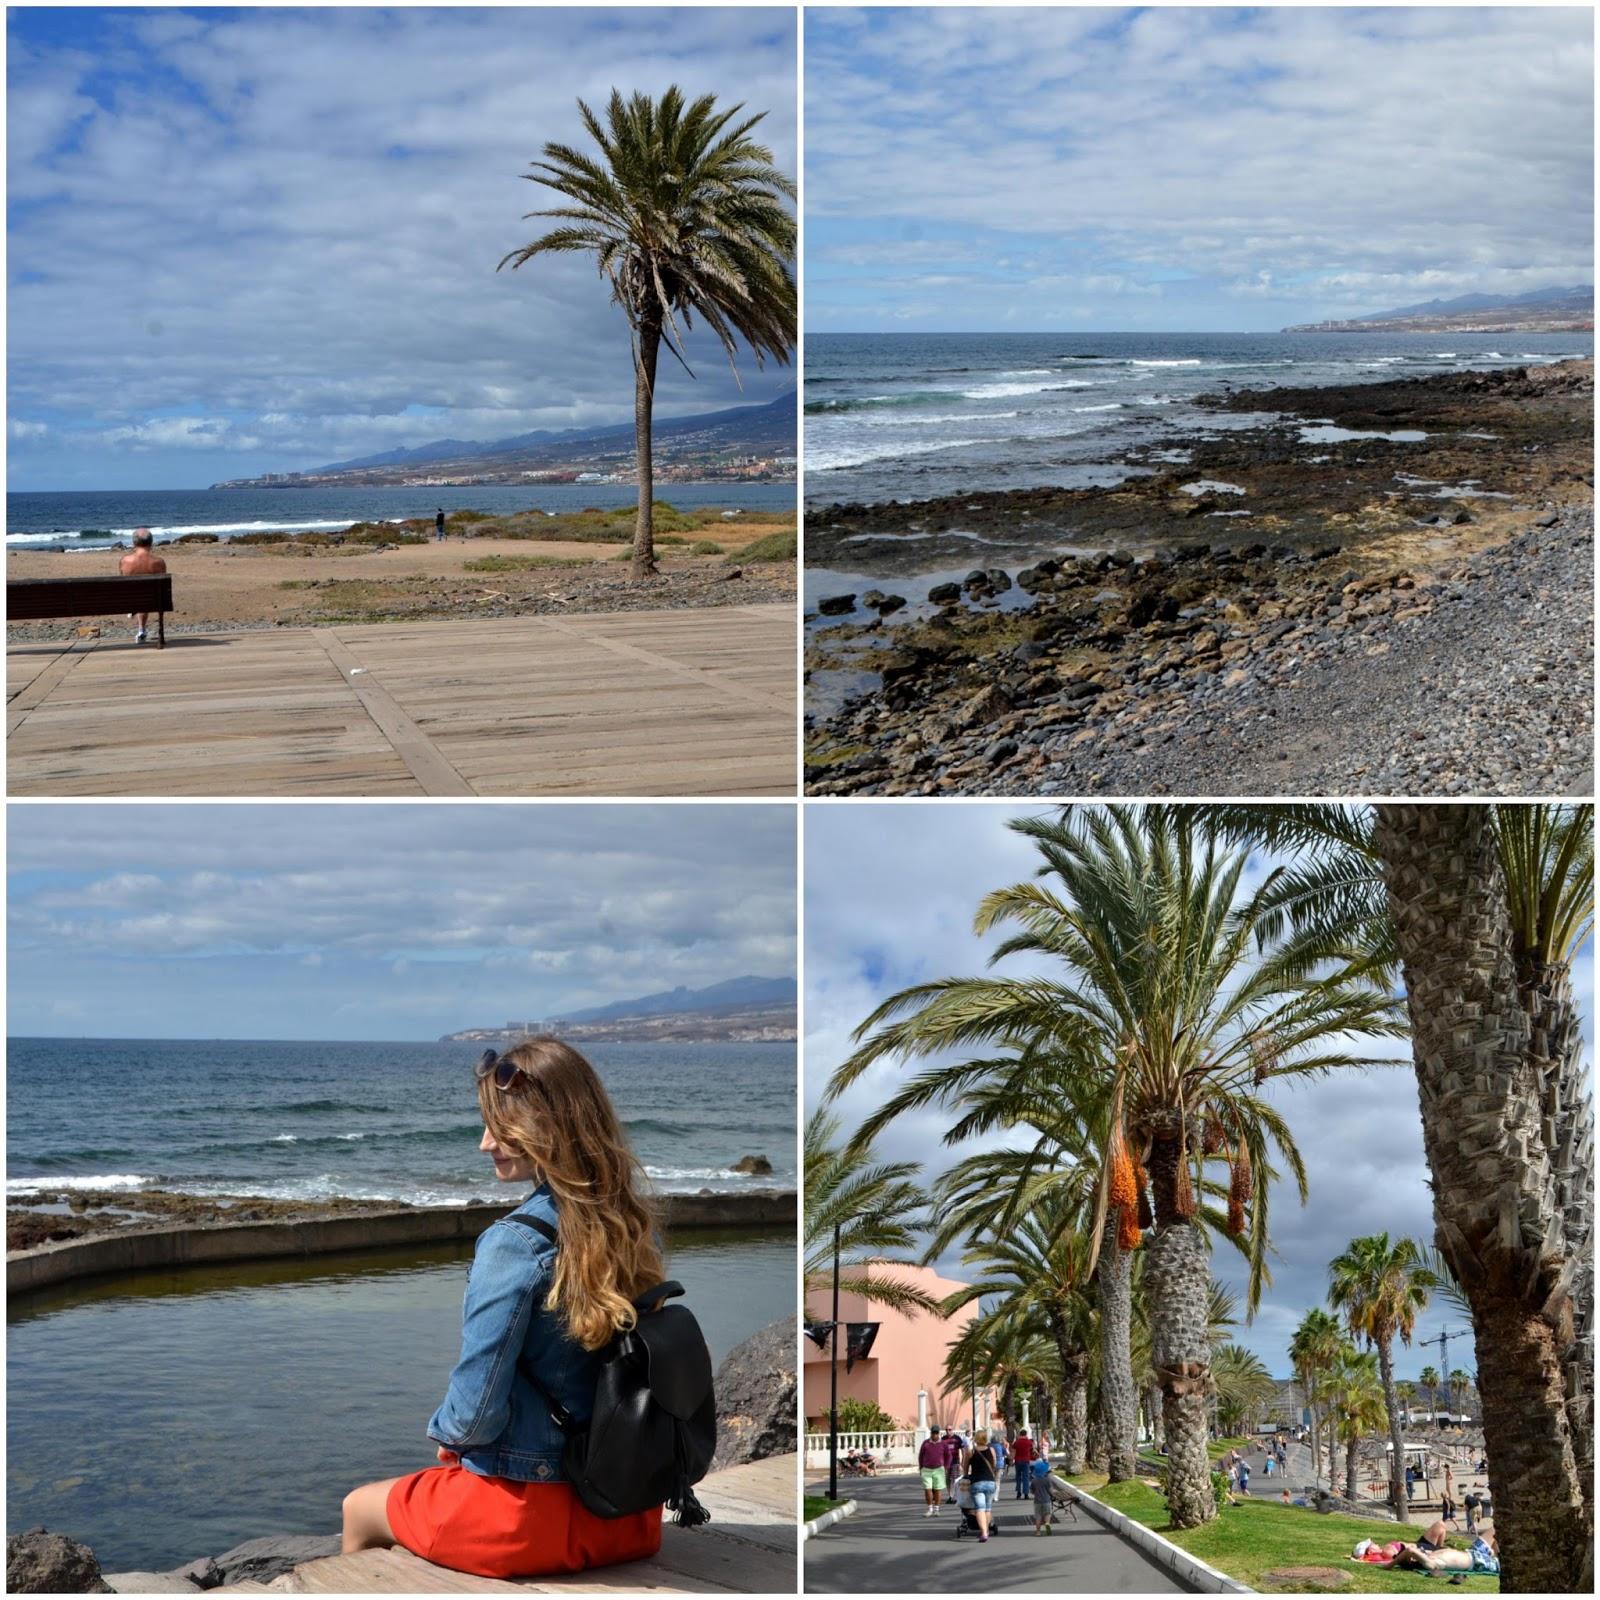 teneryfa plaża palmy widok